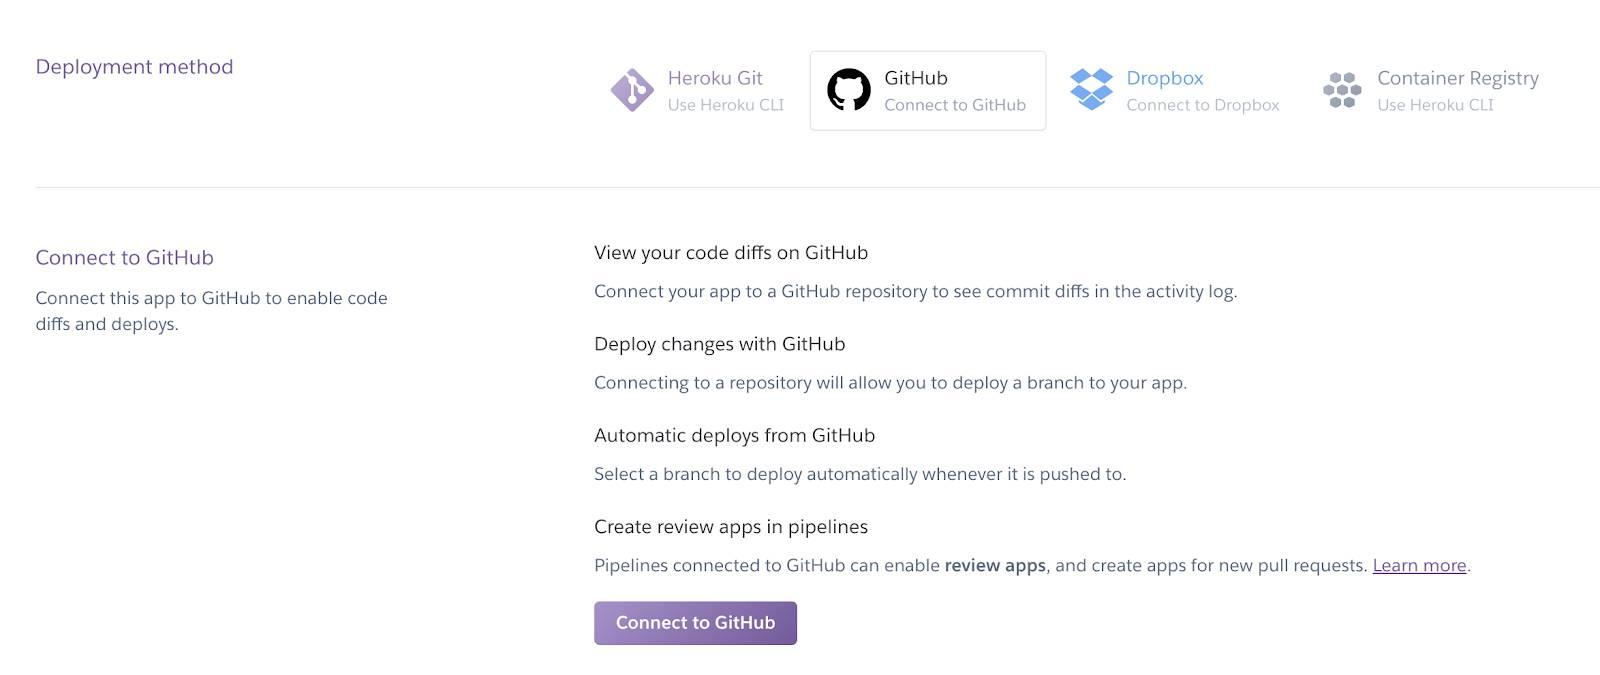 Screenshot des Heroku-Dashboards und seines Konfigurationsabschnitts 'Connect to GitHub'